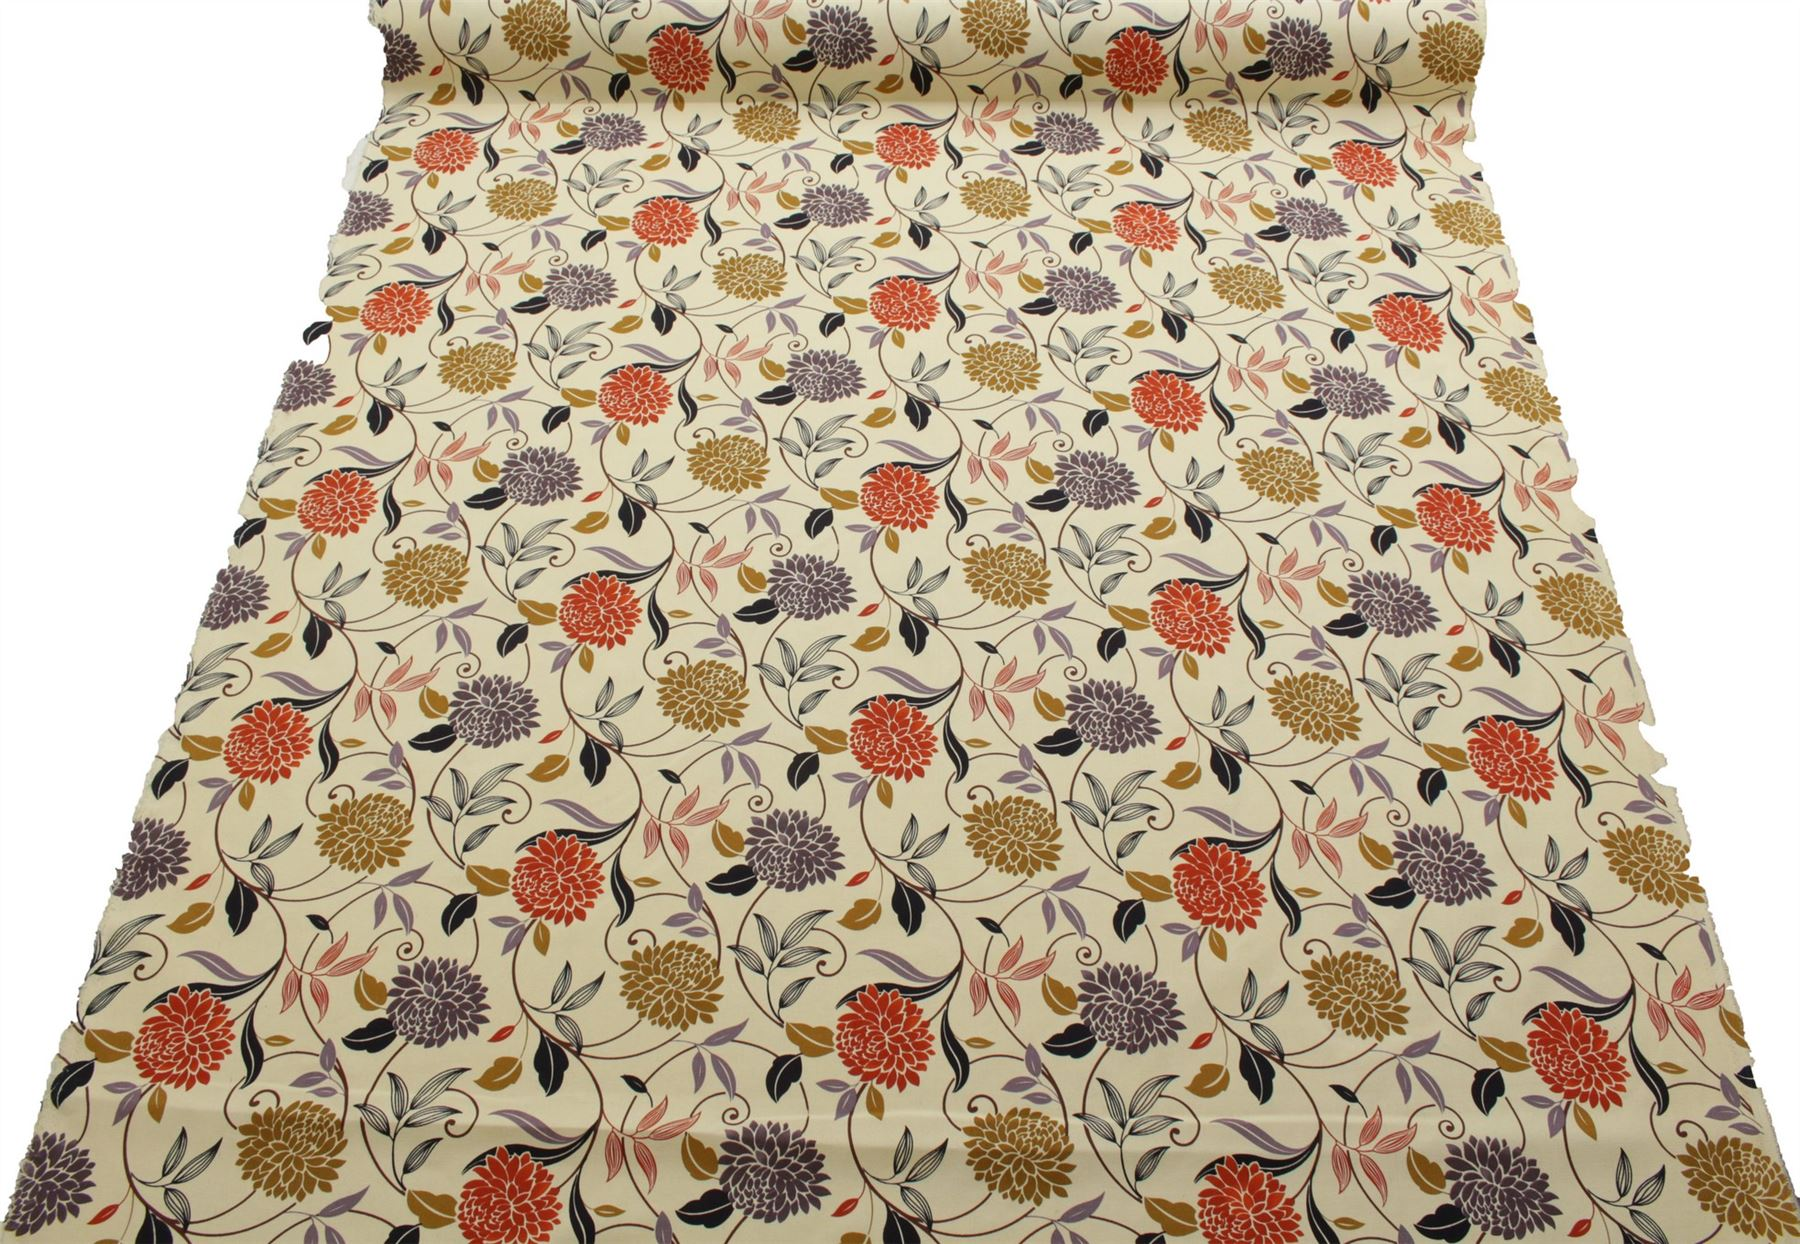 thumbnail 43 - 100% Heavy Cotton Panama Printed Childrens Curtain Cushion Upholstery Fabric